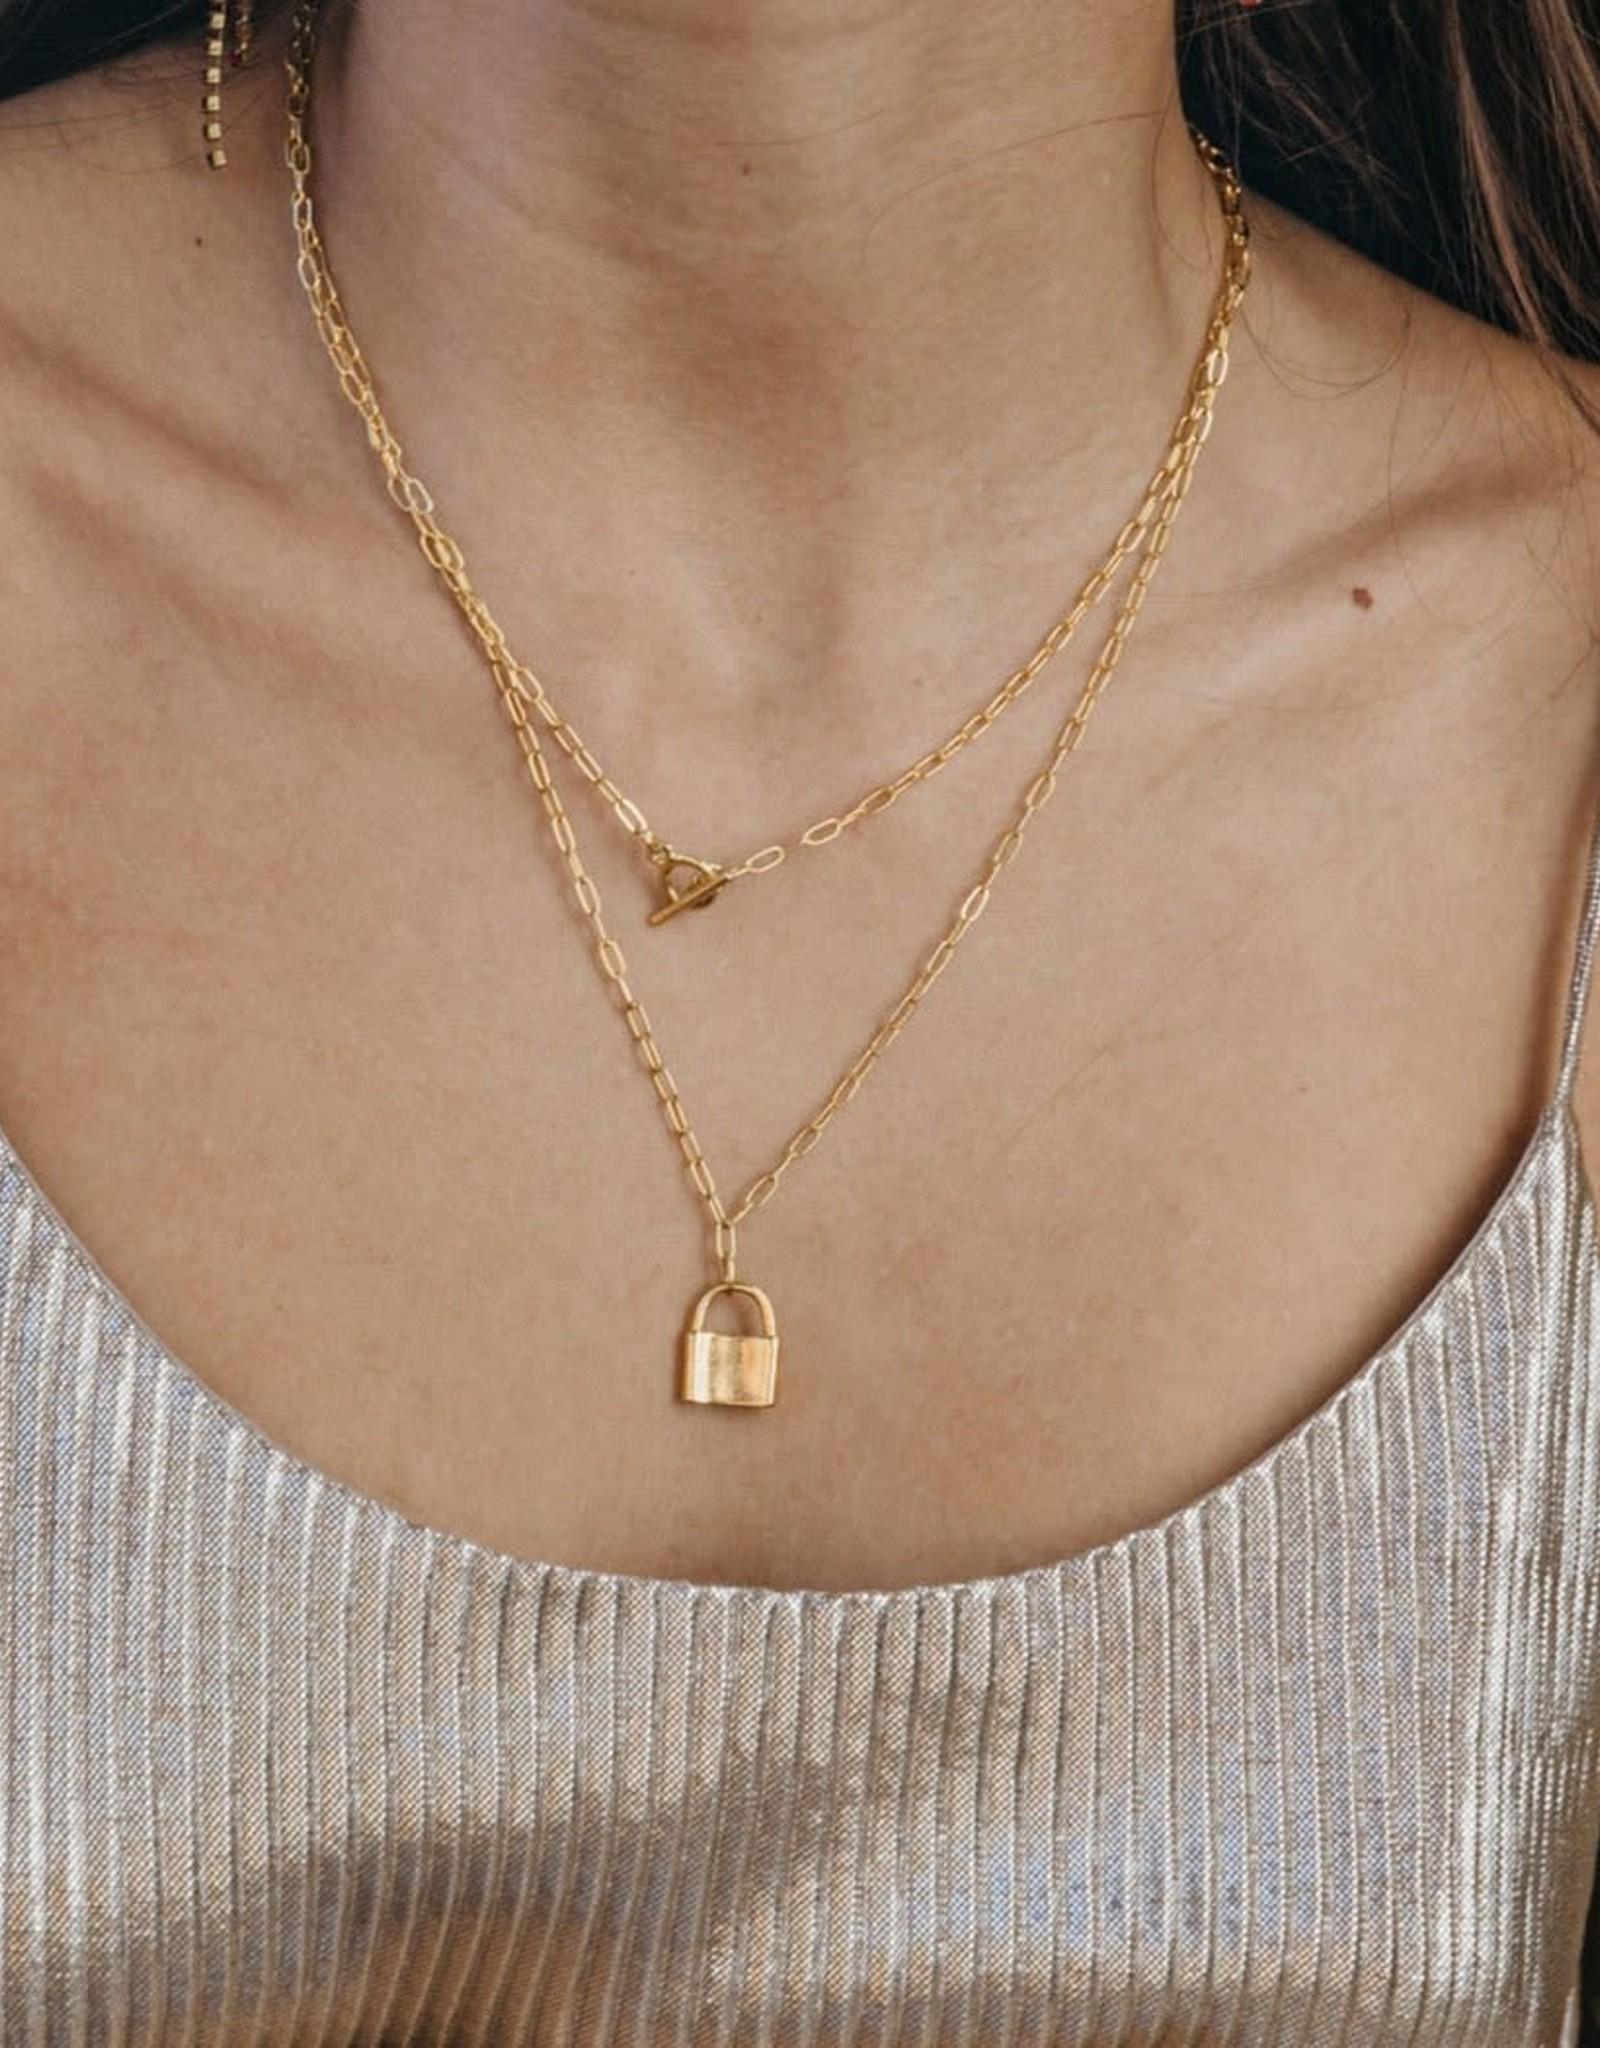 AMANO studio Padlock Necklace 14k gold over brass